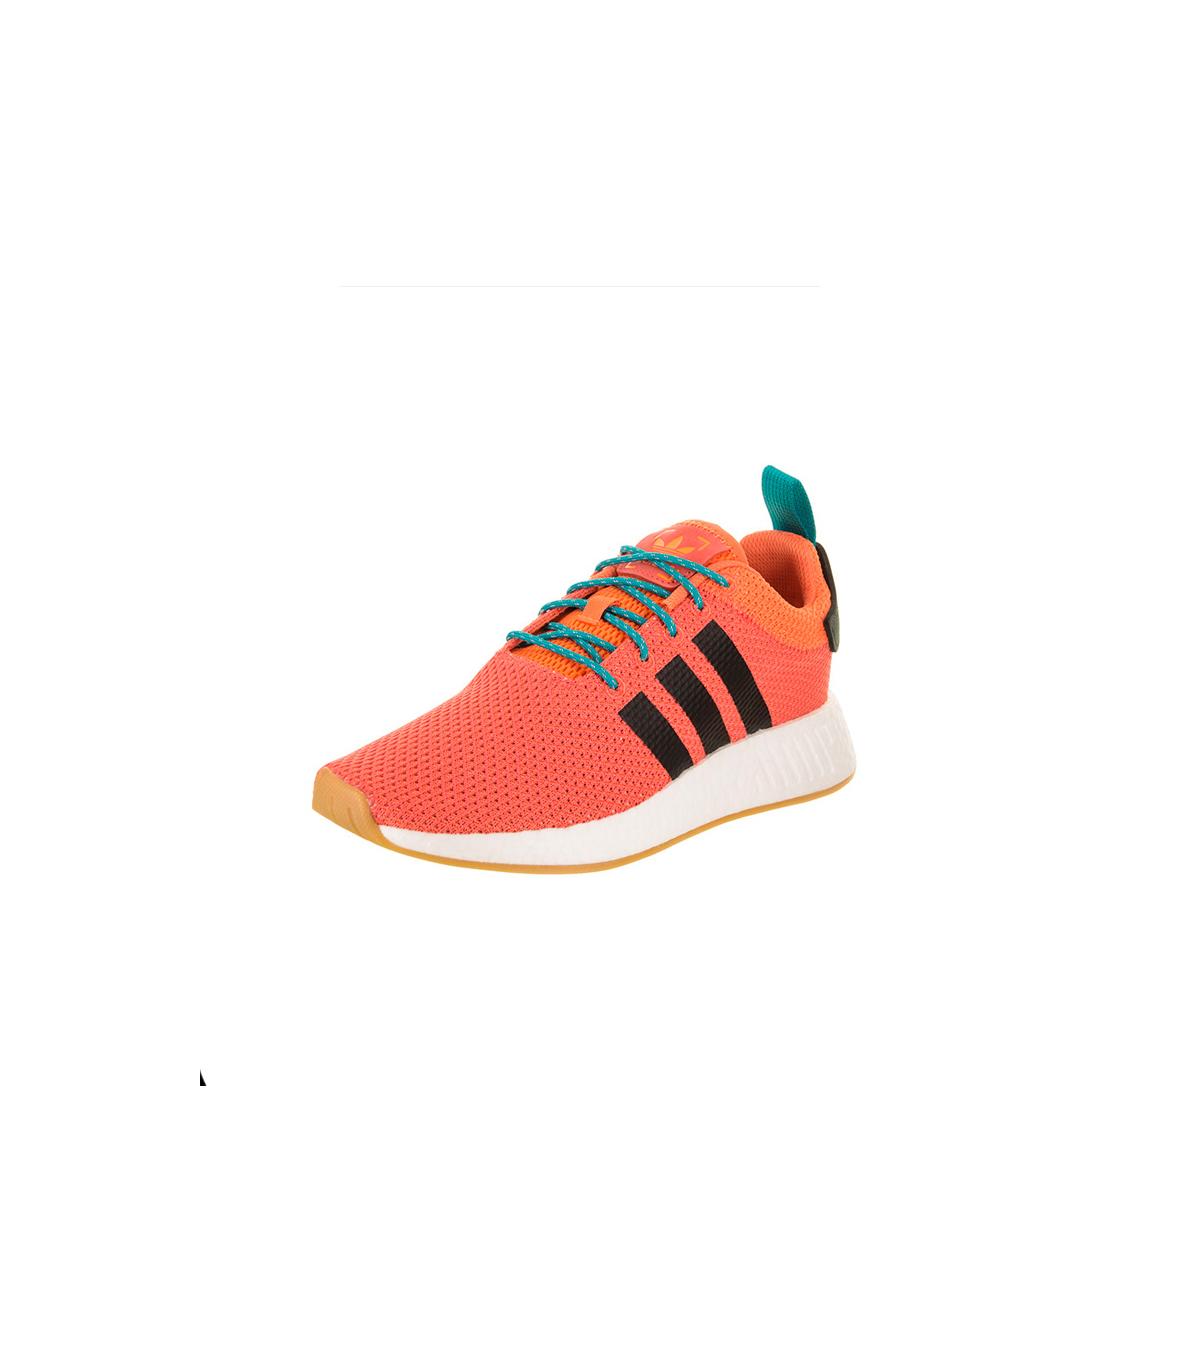 98ce8bbc3b217 Zapatillas Adidas Nmd R2 Summer